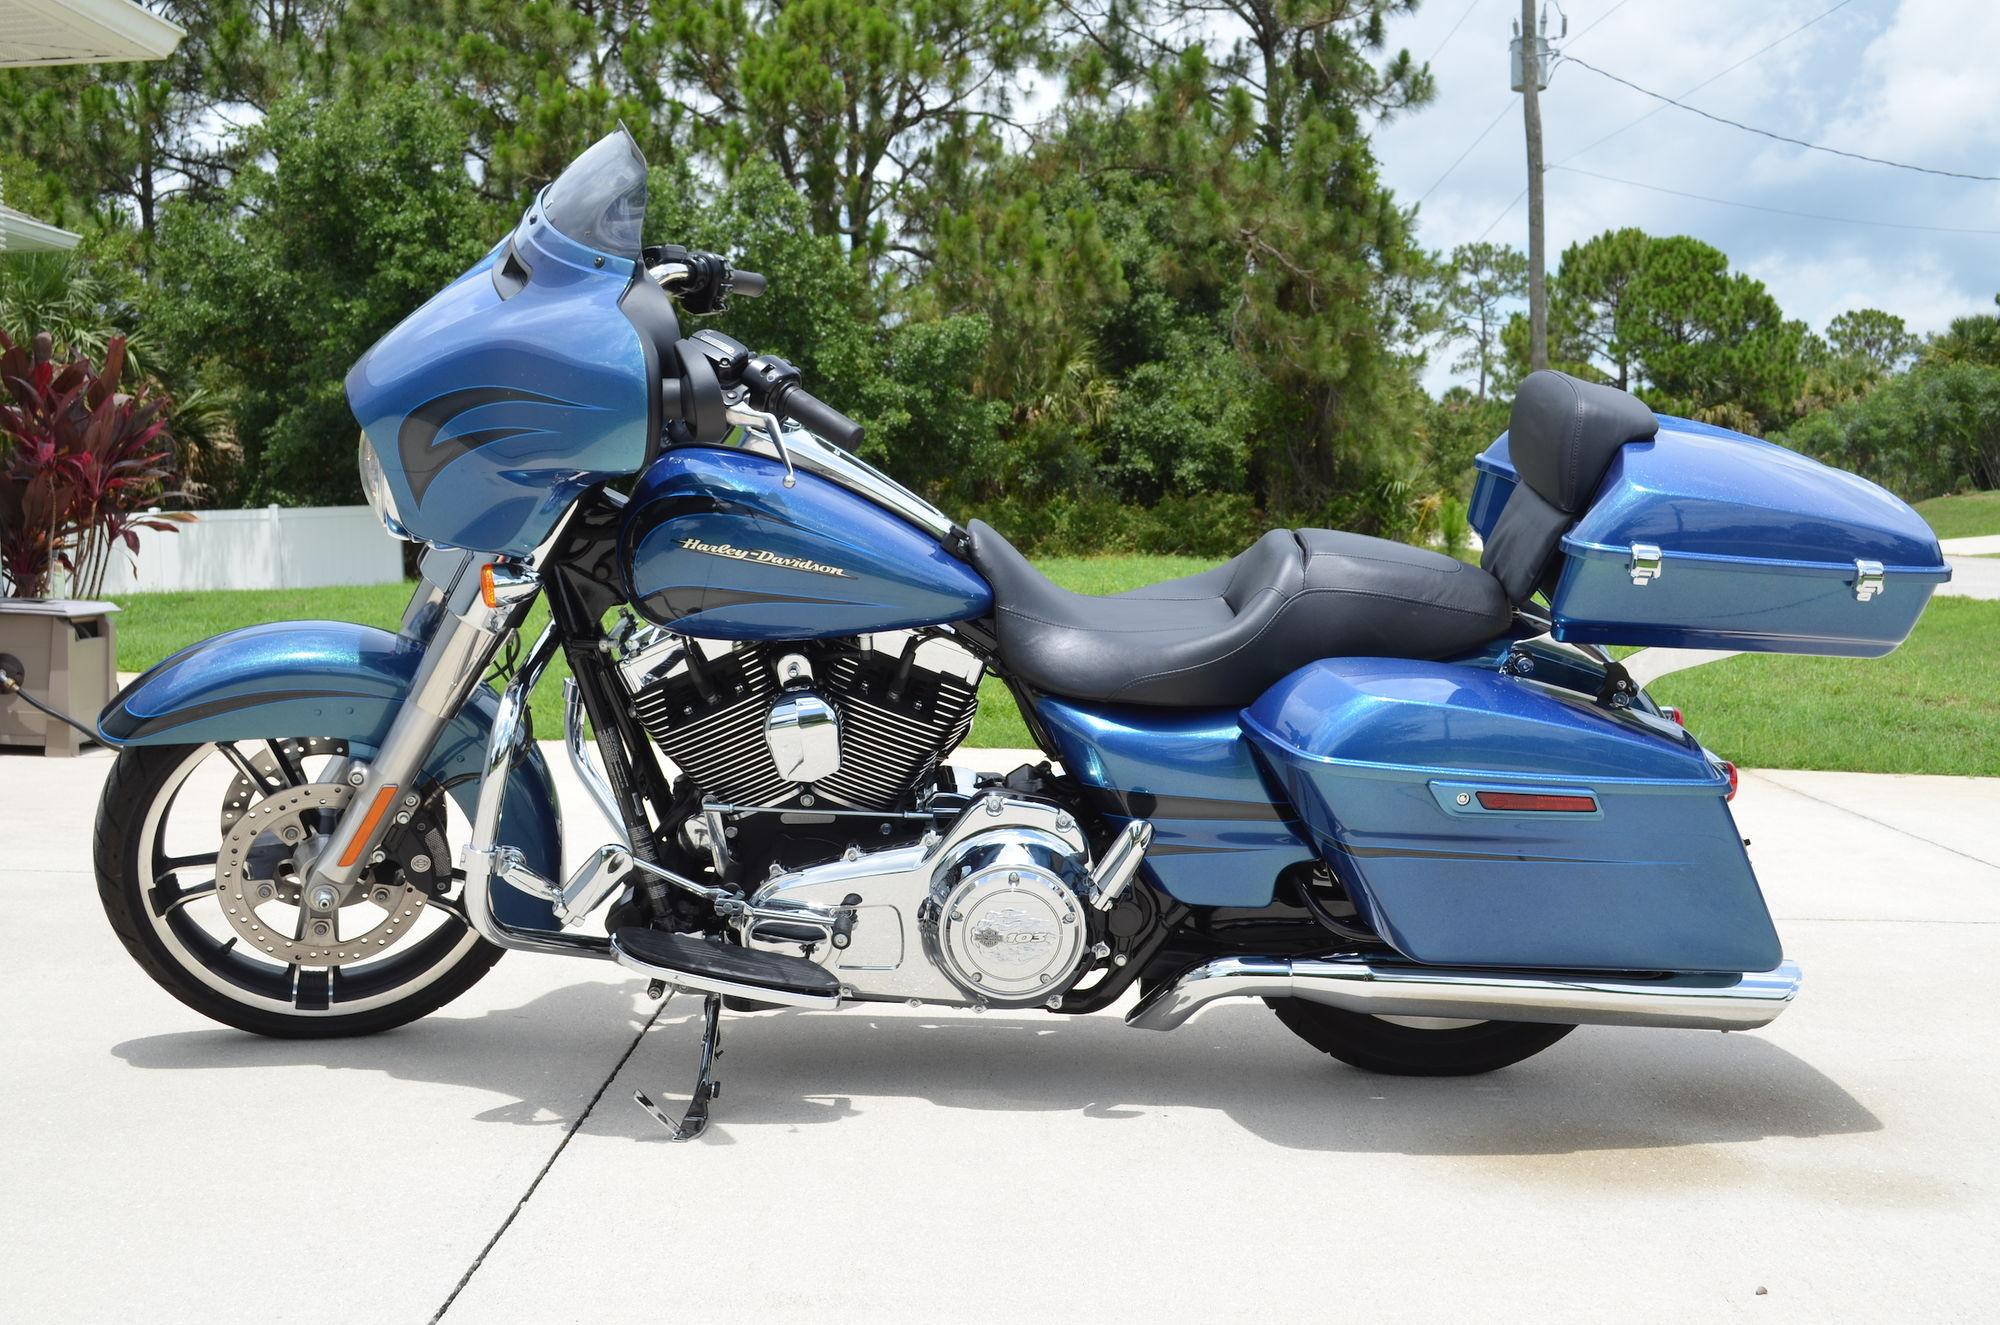 Harley Davidson Street Glide Cvo Tour Pak